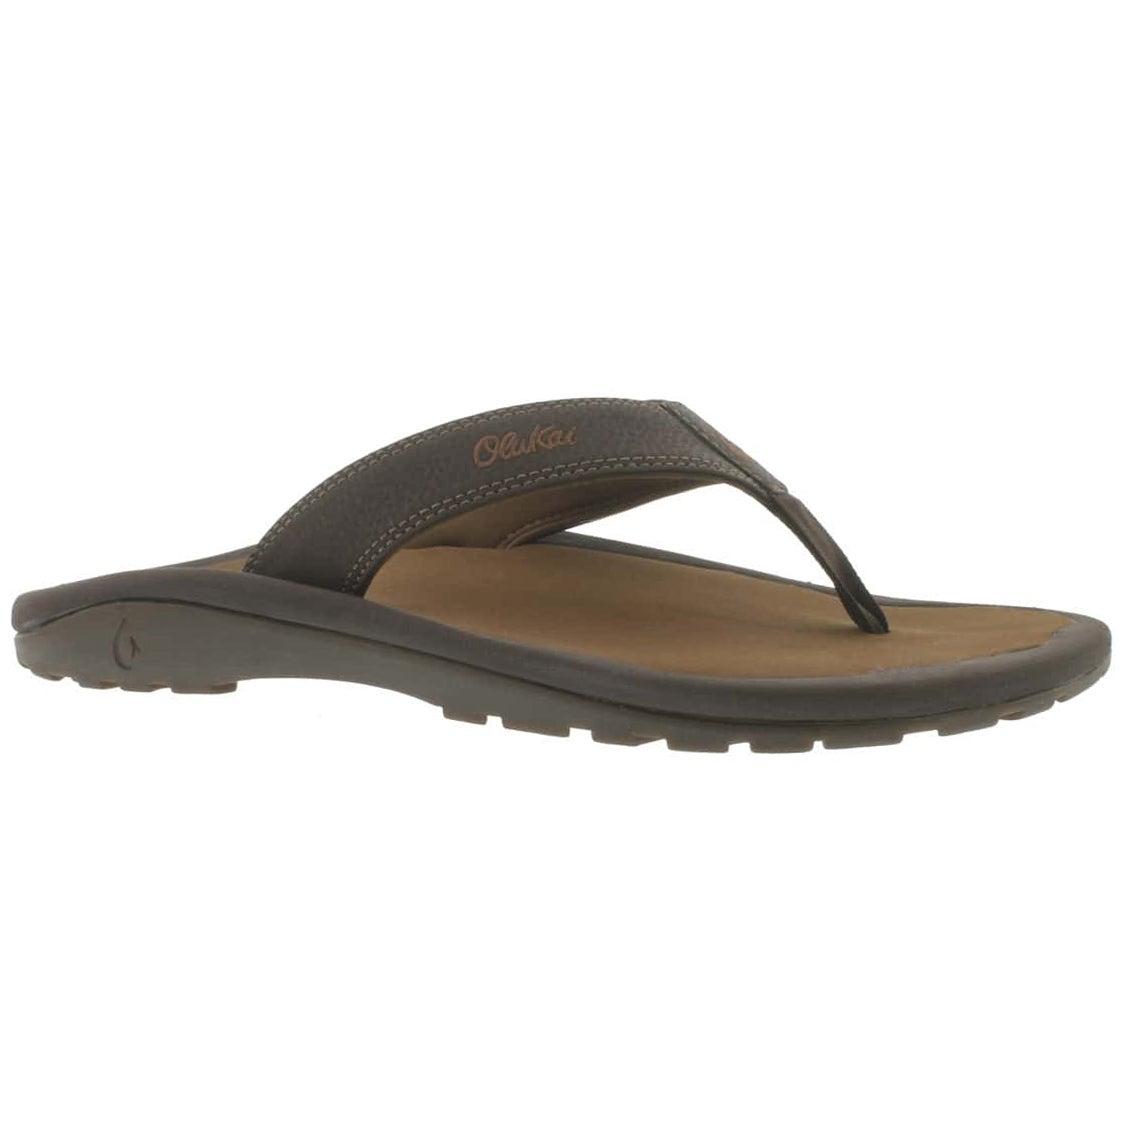 Sandale tong OHANA, java foncé, hommes